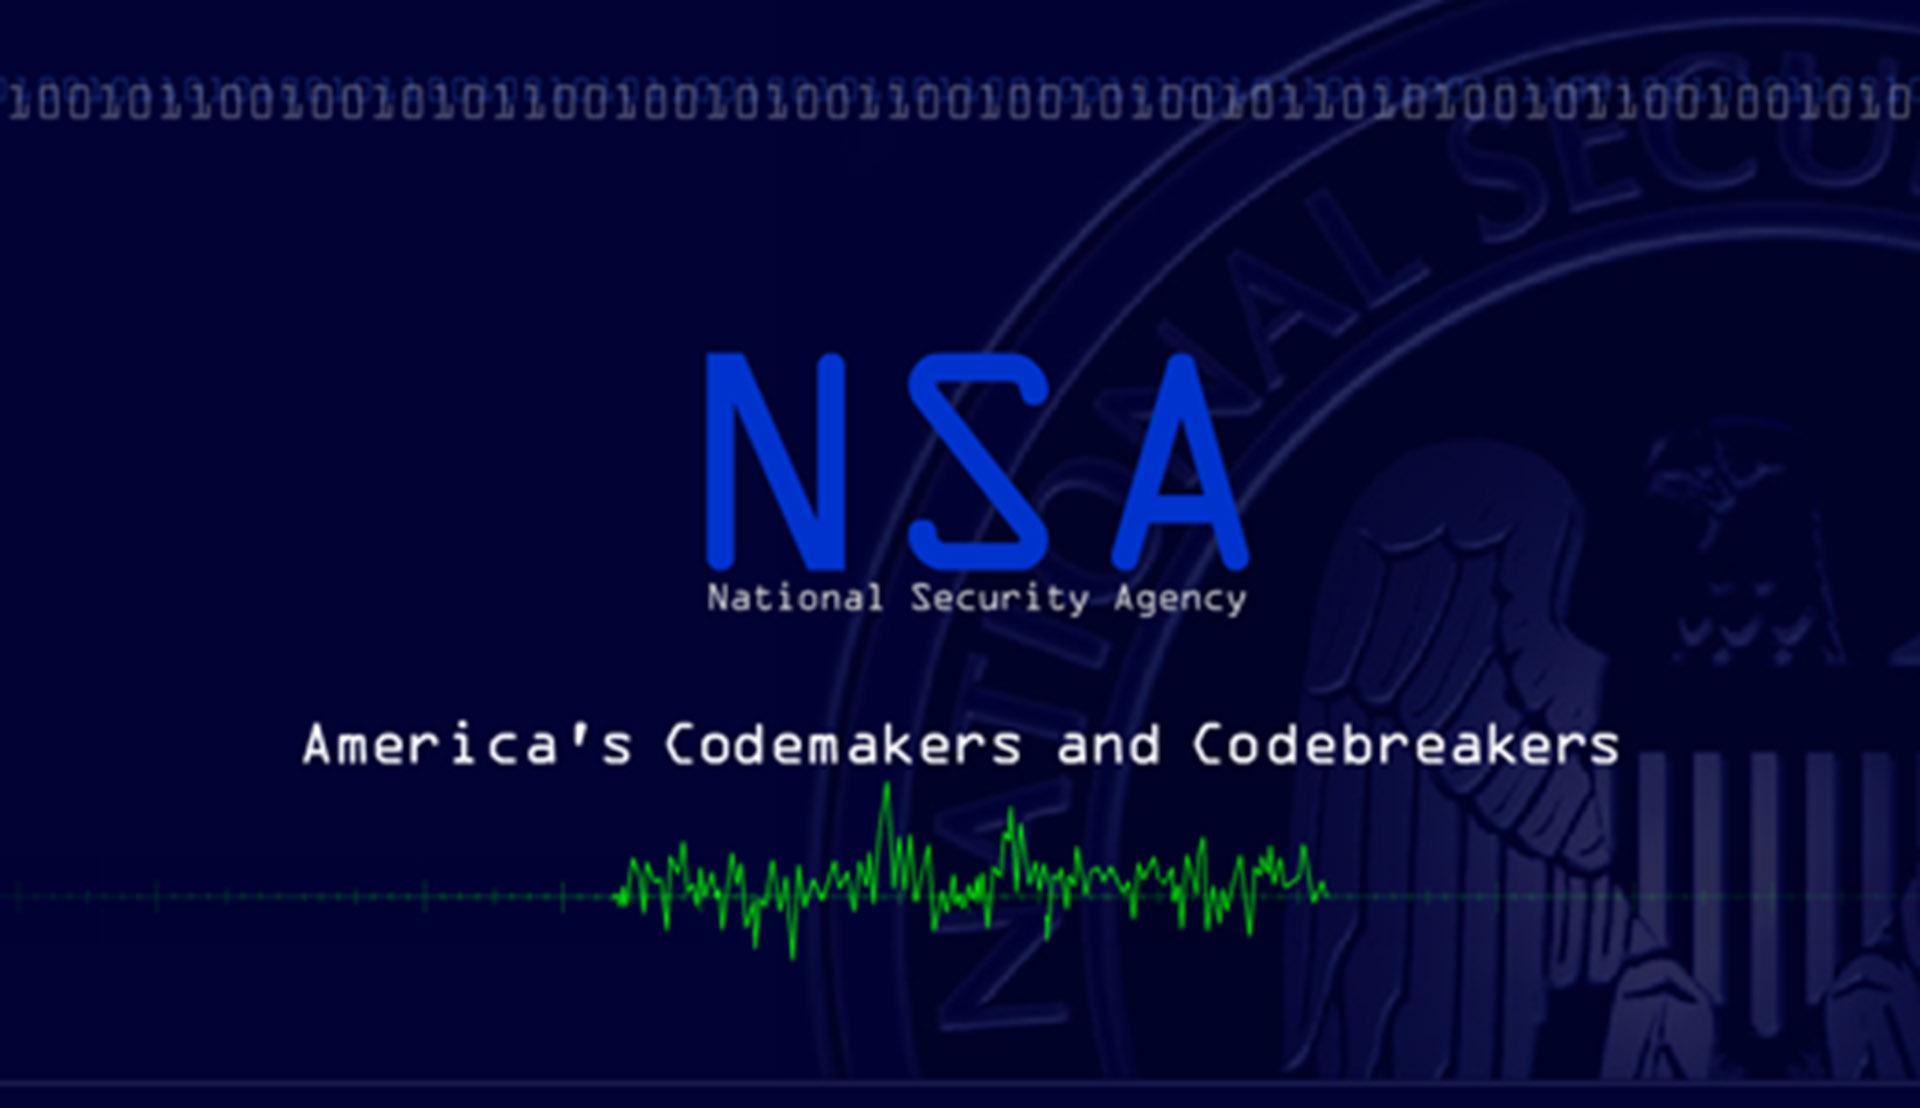 NSA_1_lg